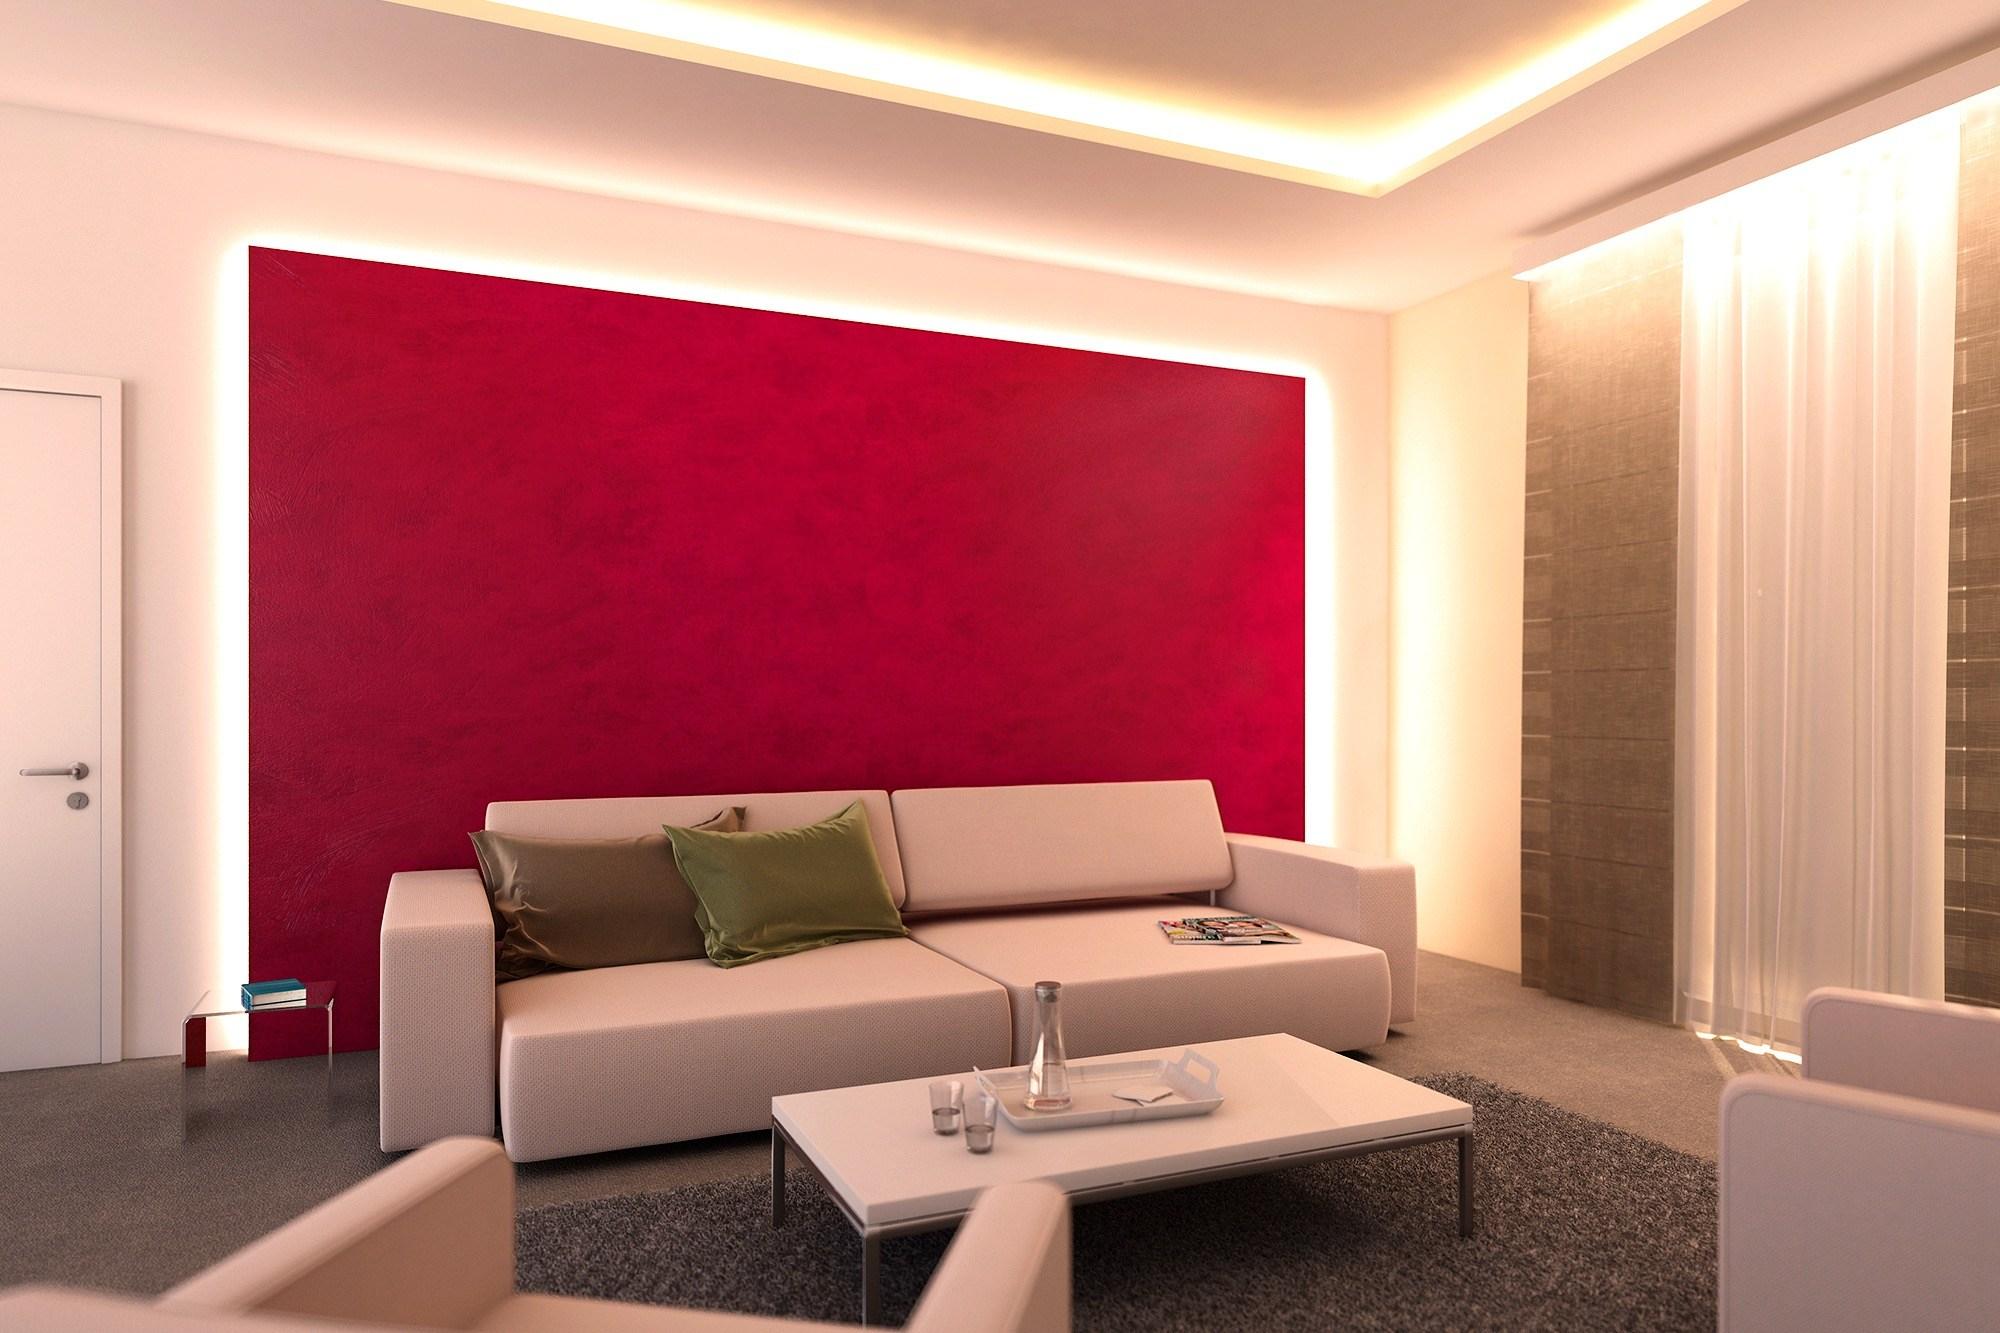 Led Wohnzimmer Konzept